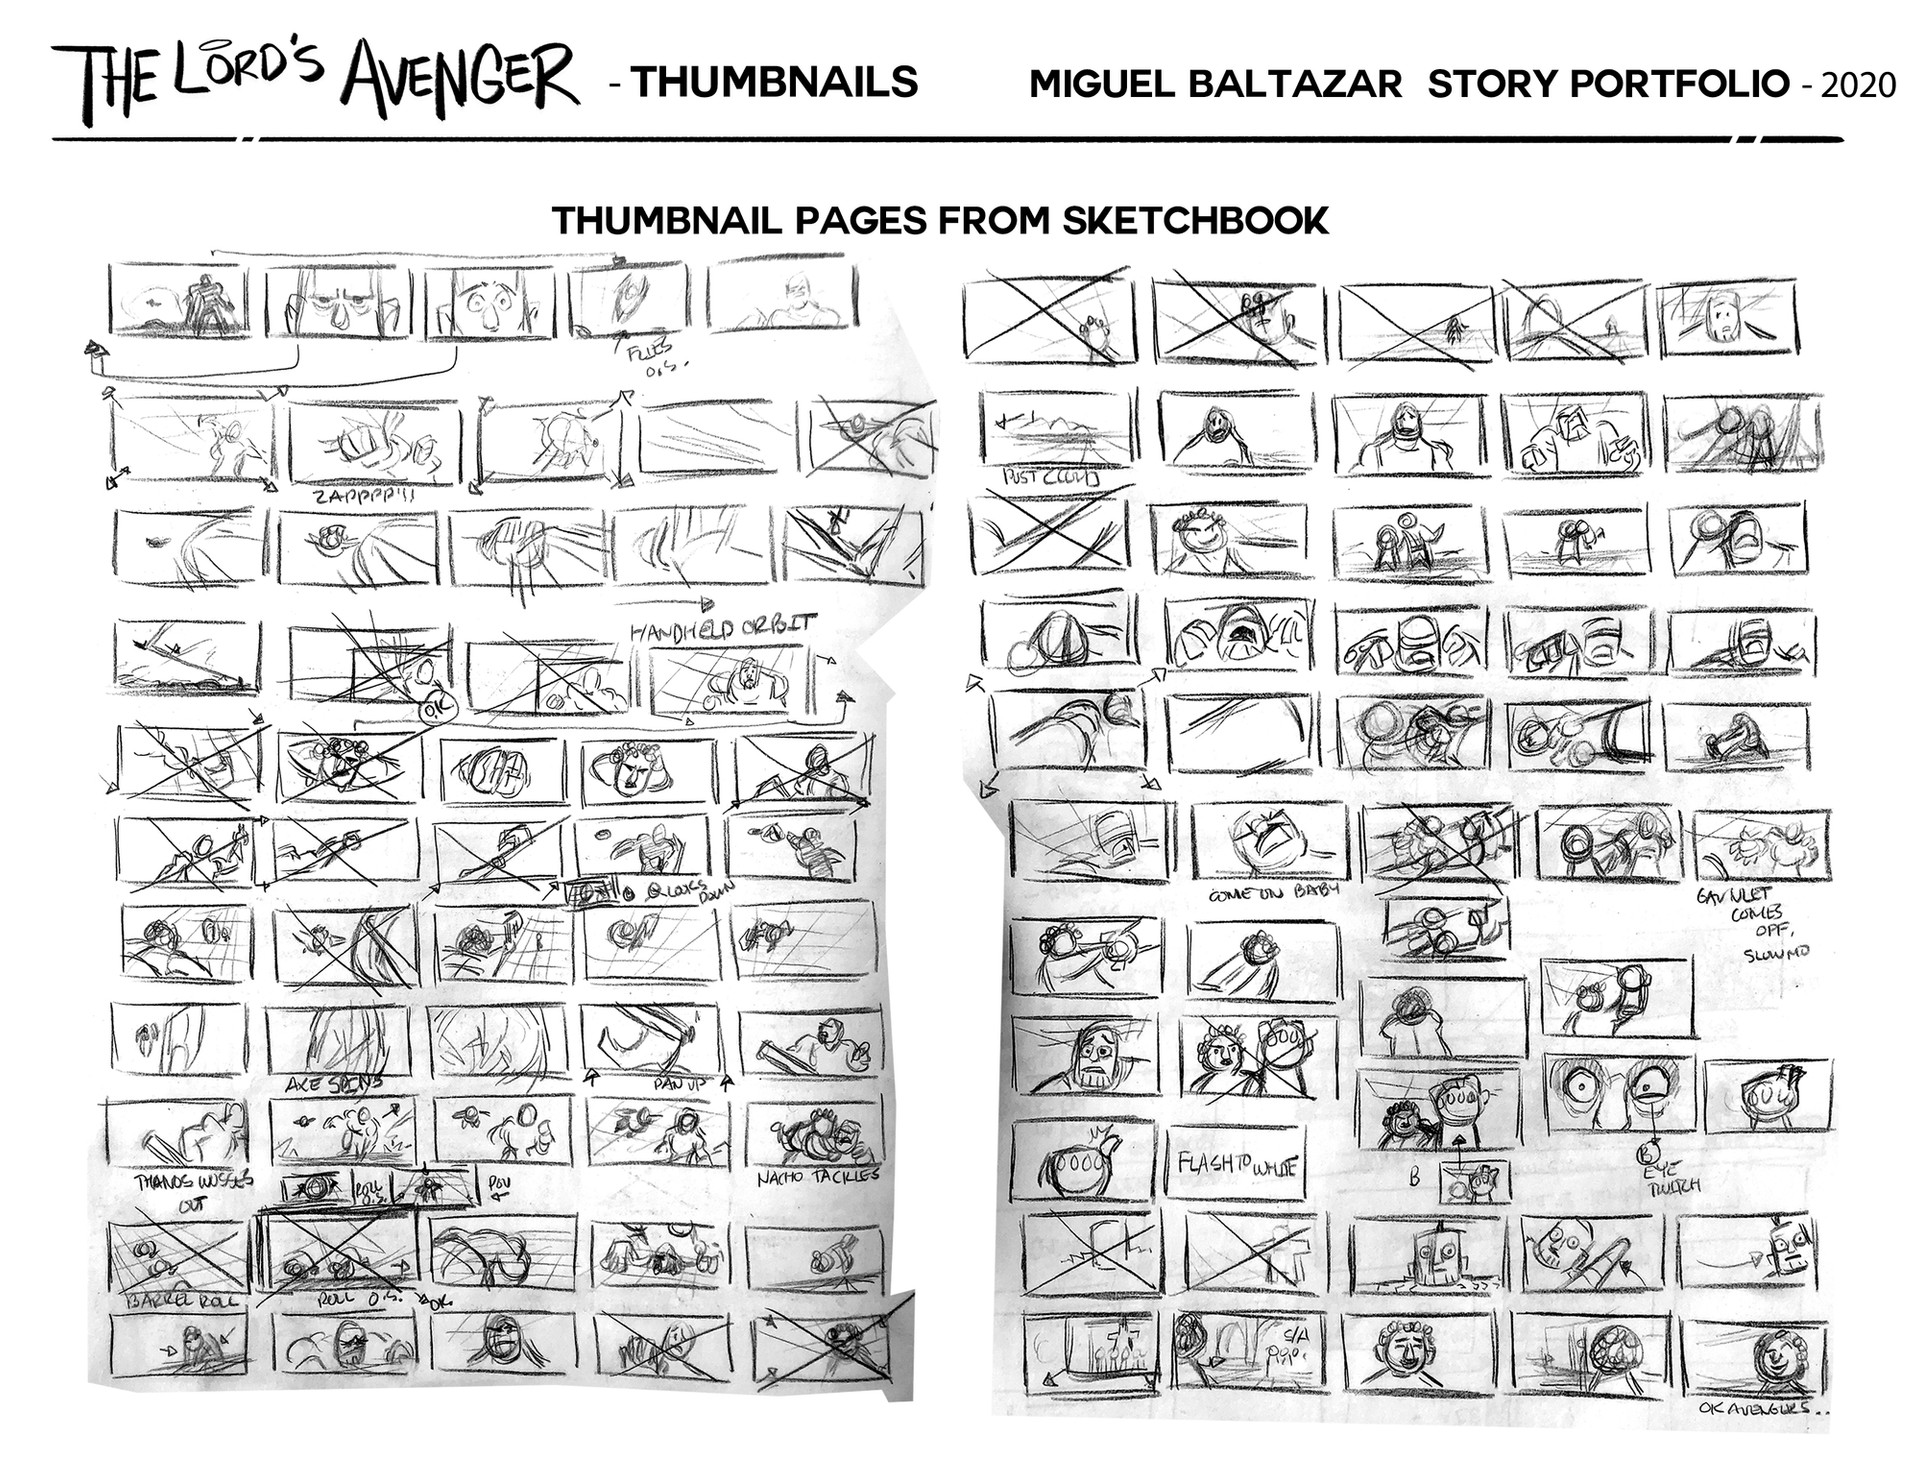 Sketches_NachoBoard_ThumbnailPages.jpg